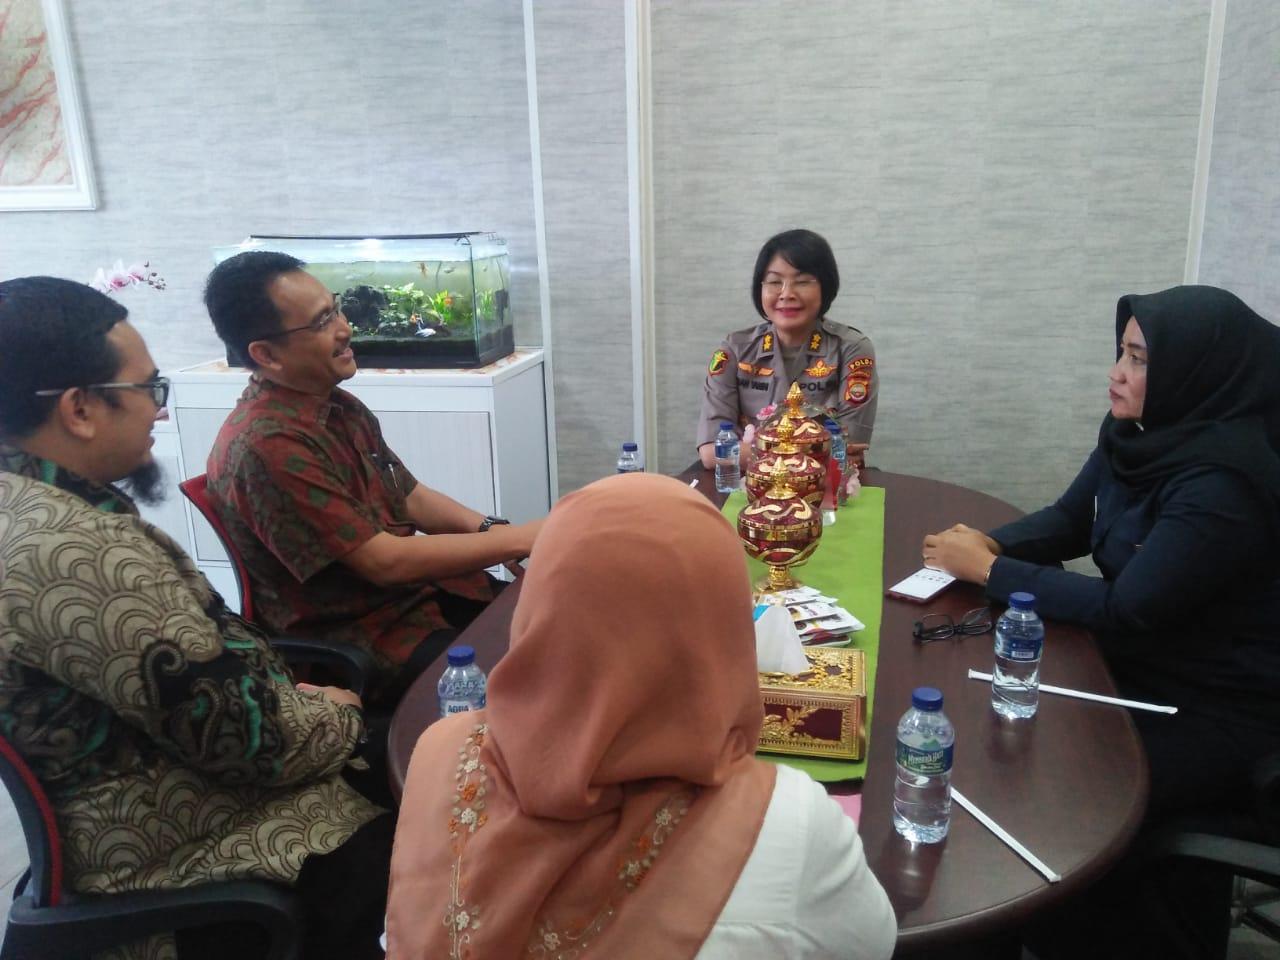 Dekan FKIK Jajaki RS Bhayangkara Biddokkes Polda Bengkulu sebagai Wahana Pendidikan Ilmu Forensik FKIK UNIB